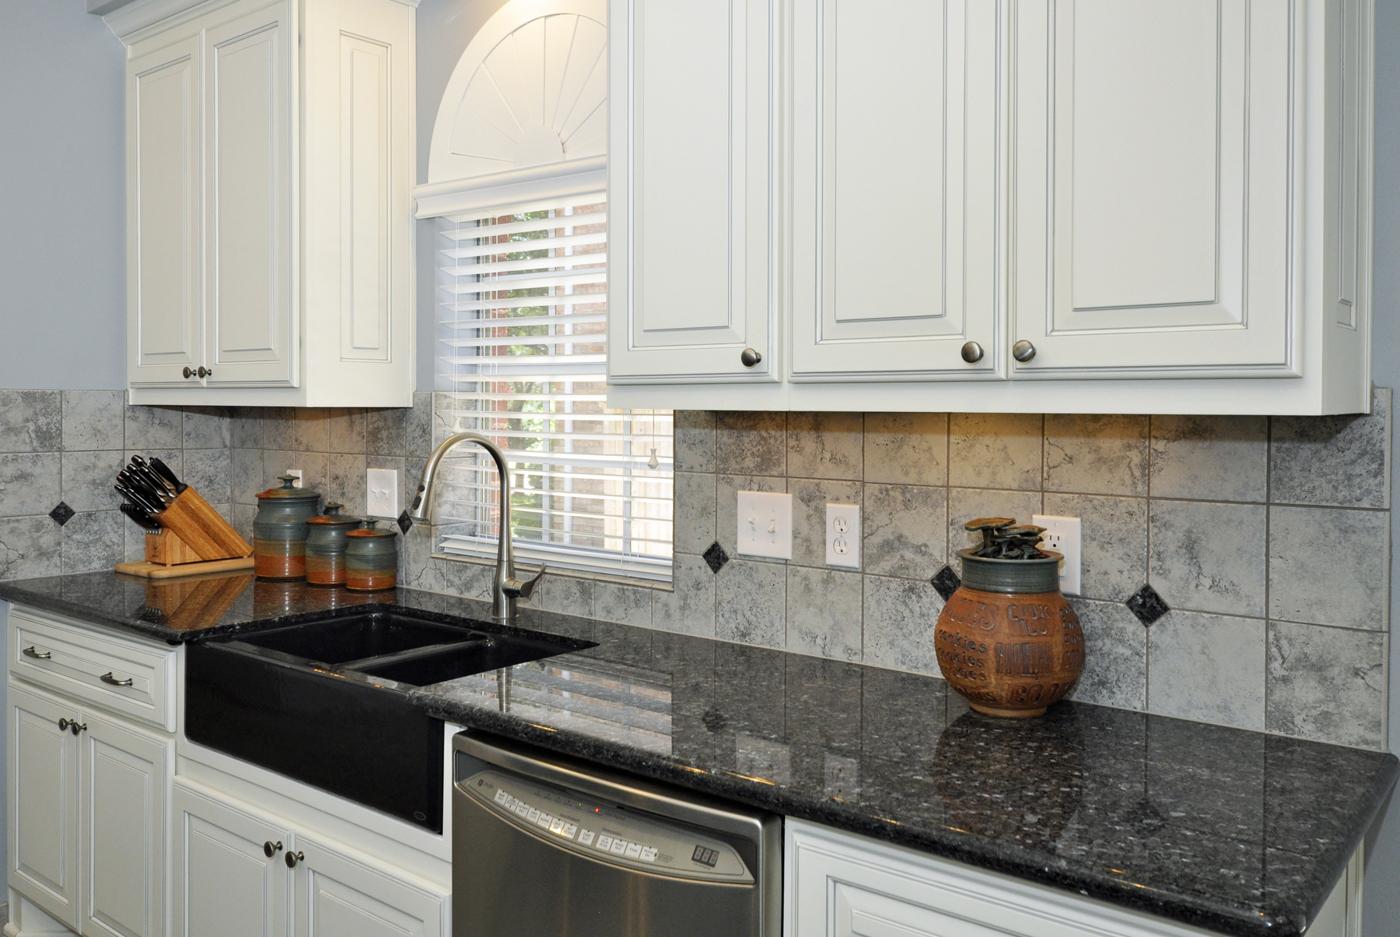 Hamres Floors Hamres Remodeling Flooring Kitchen And Bath Ask Home Design